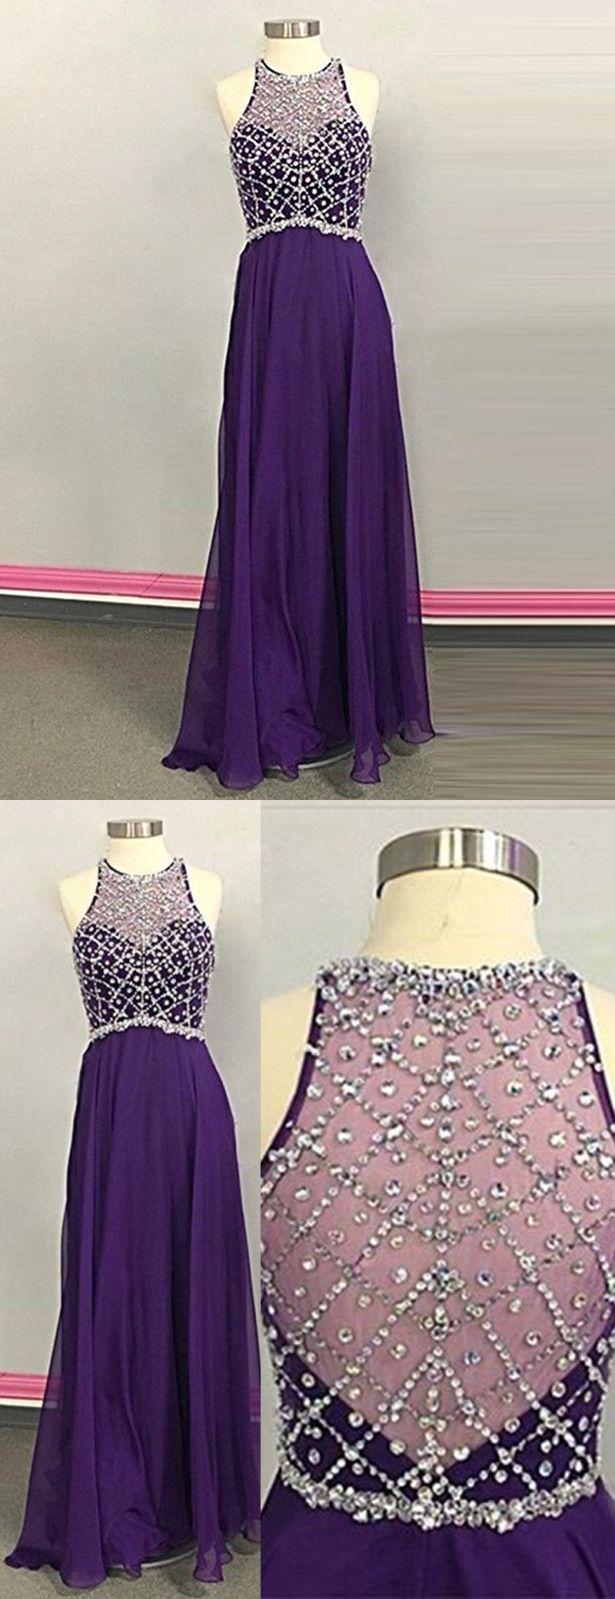 Nice Prom Dress,Jewel Prom Dress,Sleeveless Prom Dress,Long Prom Dress,Purple Prom Dress,Illusion Back Prom Dress,Beading Prom Dress,Prom Dress,Prom Dresses,2017 Prom Dress,2017 Prom Dresses